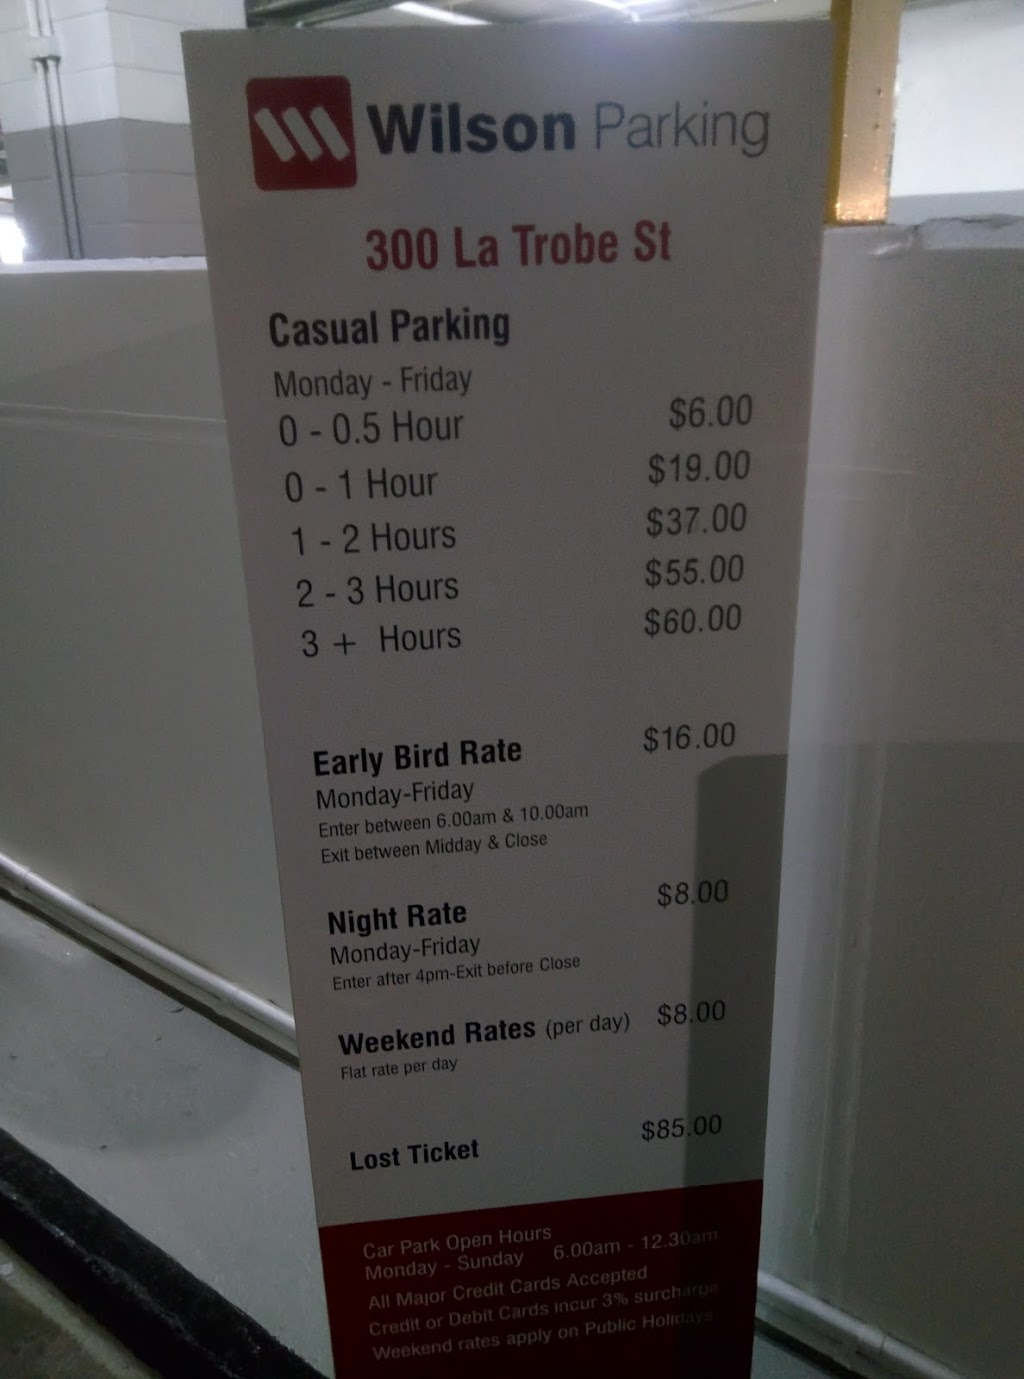 Wilson Parking - 300 La Trobe St   parking   300 La Trobe St, Melbourne VIC 3000, Australia   1800727546 OR +61 1800 727 546